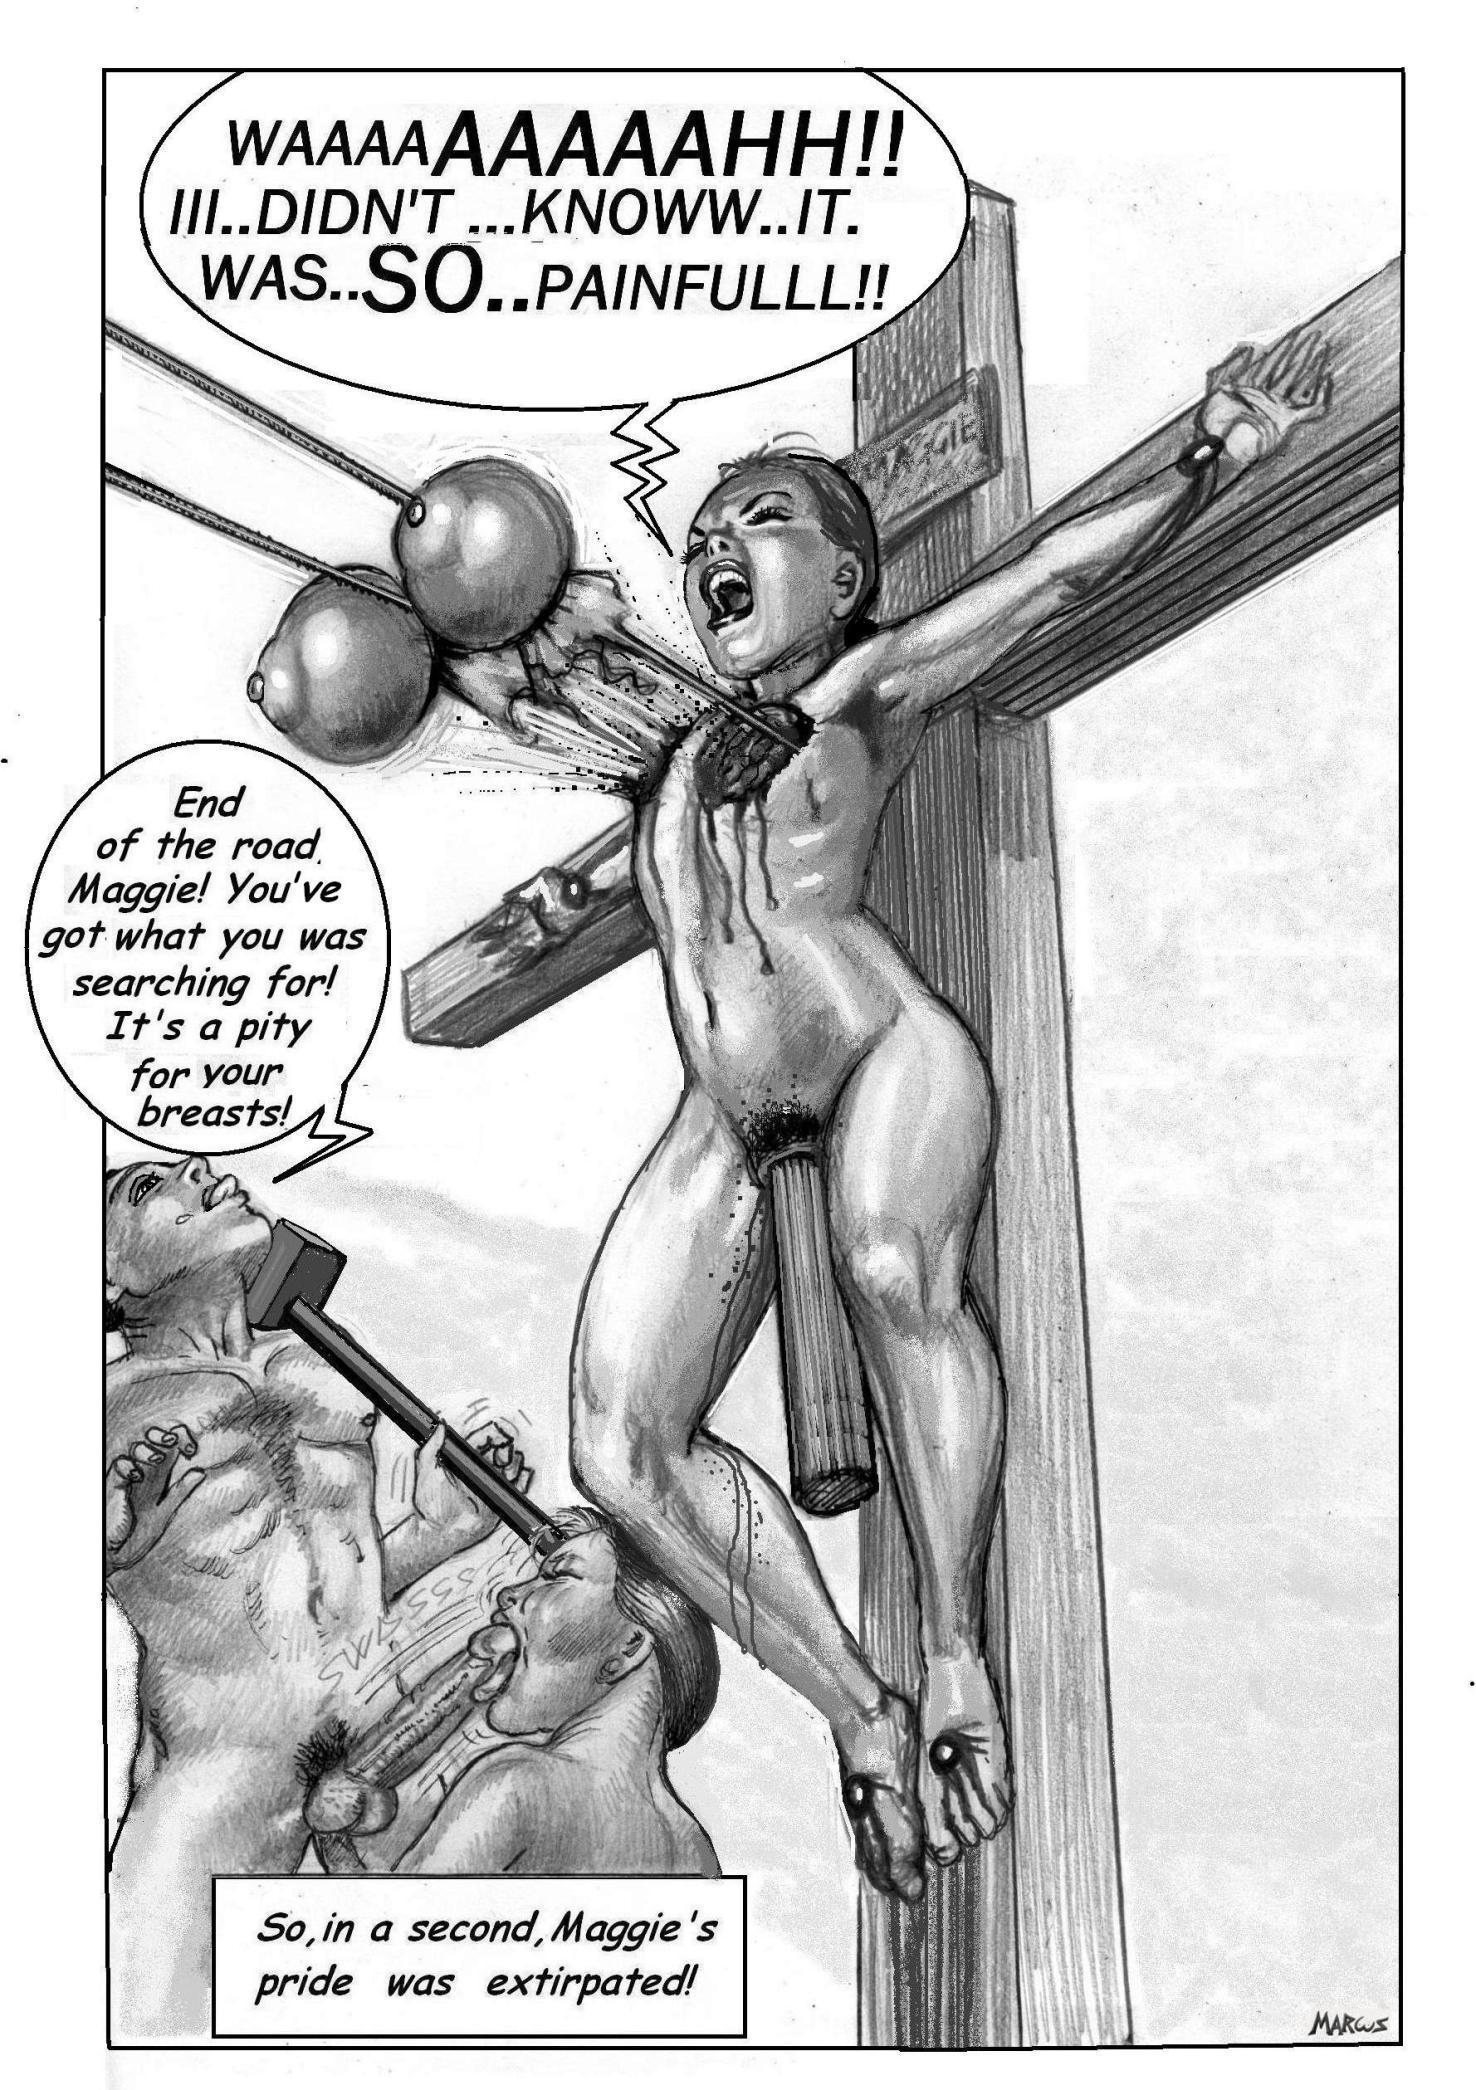 Anatomy attitudes to masturbation